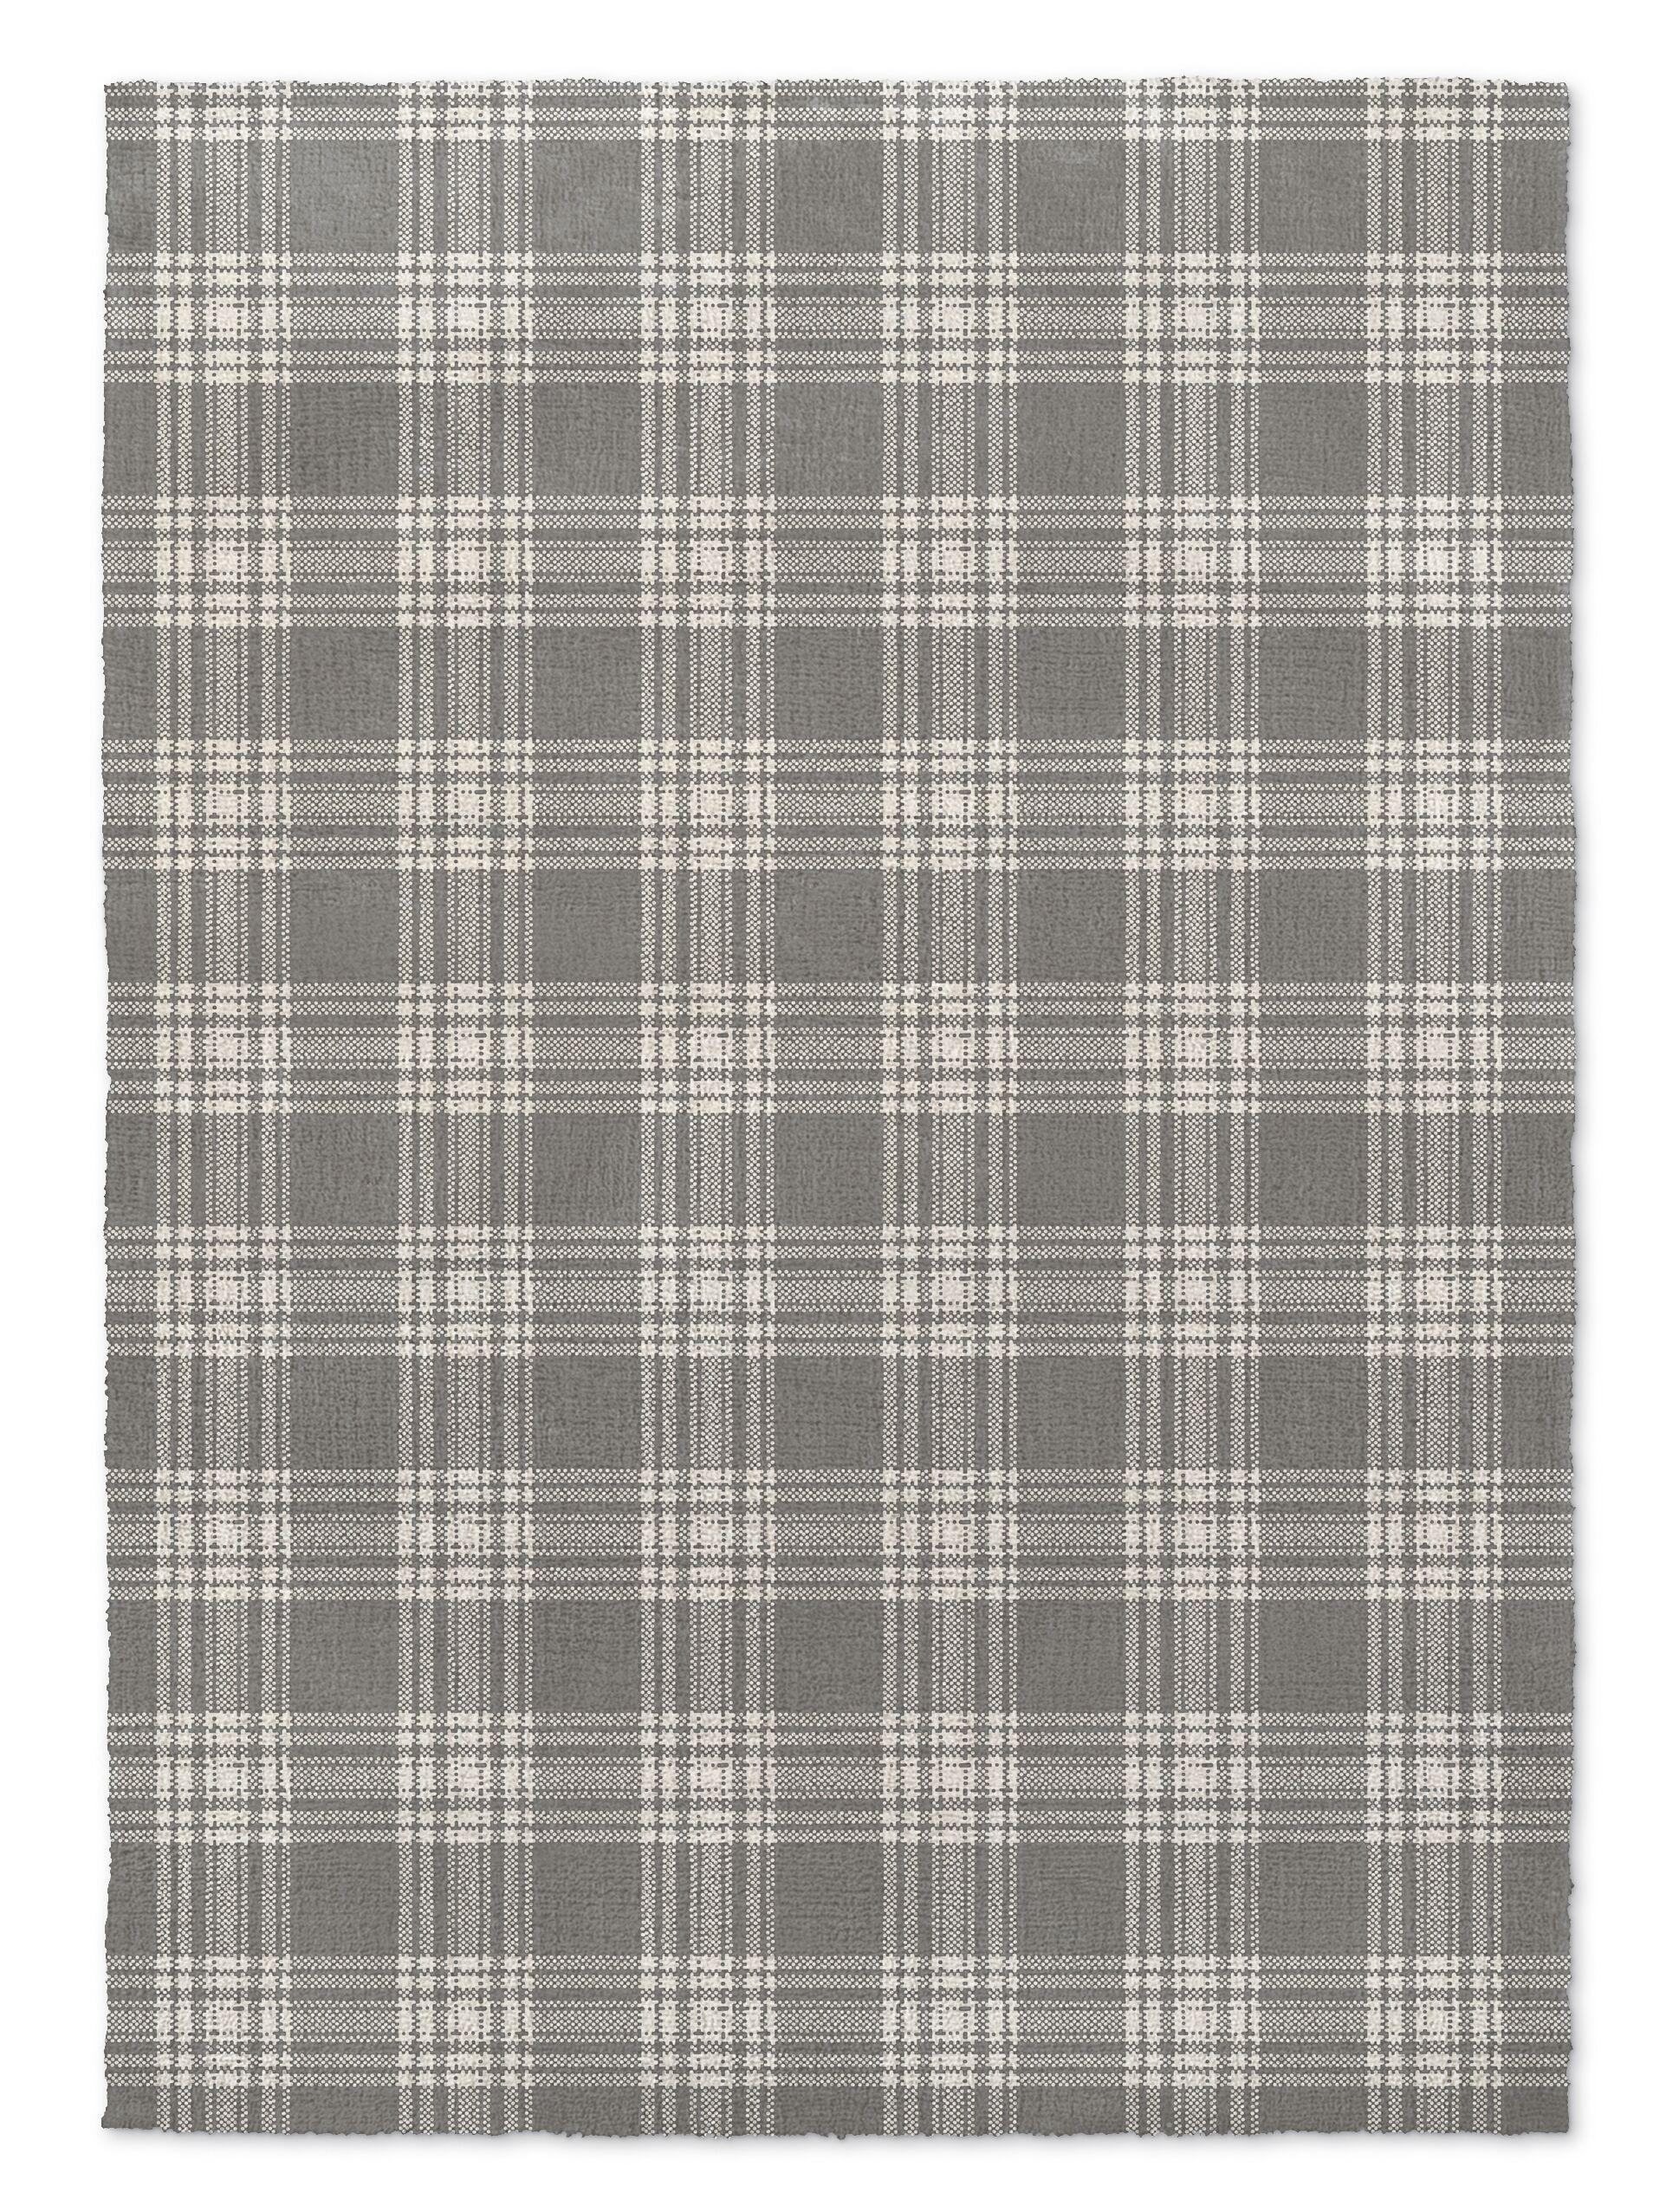 Montalvo Dark Gray Area Rug Rug Size: Rectangle 3' x 5'